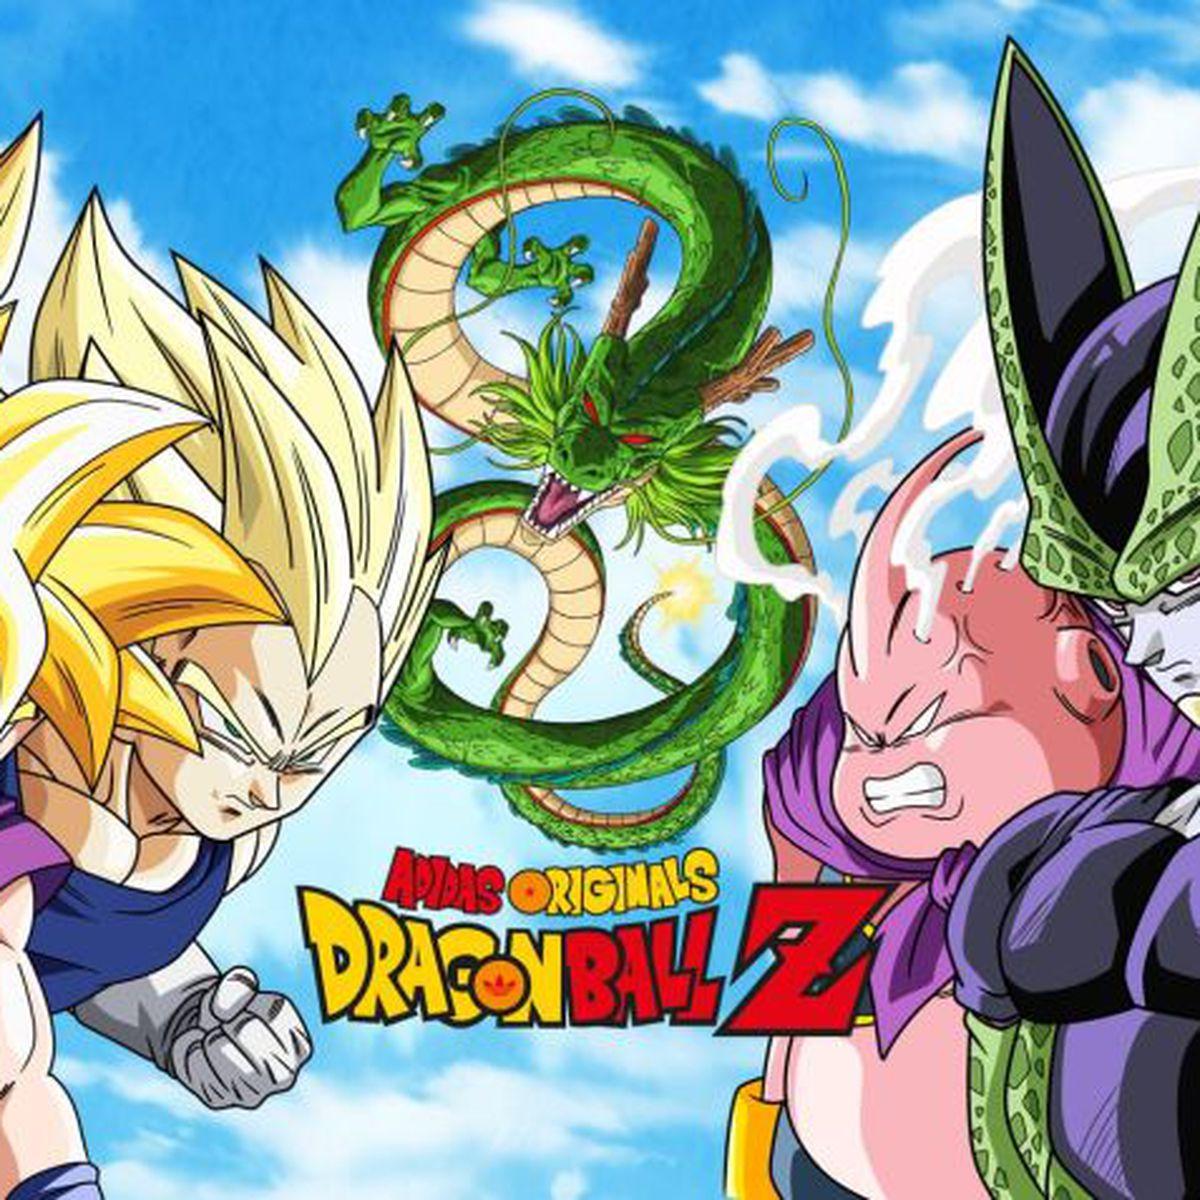 Dragon Ball Super Broly Anuncian Nuevo Juego De Bandai Namco